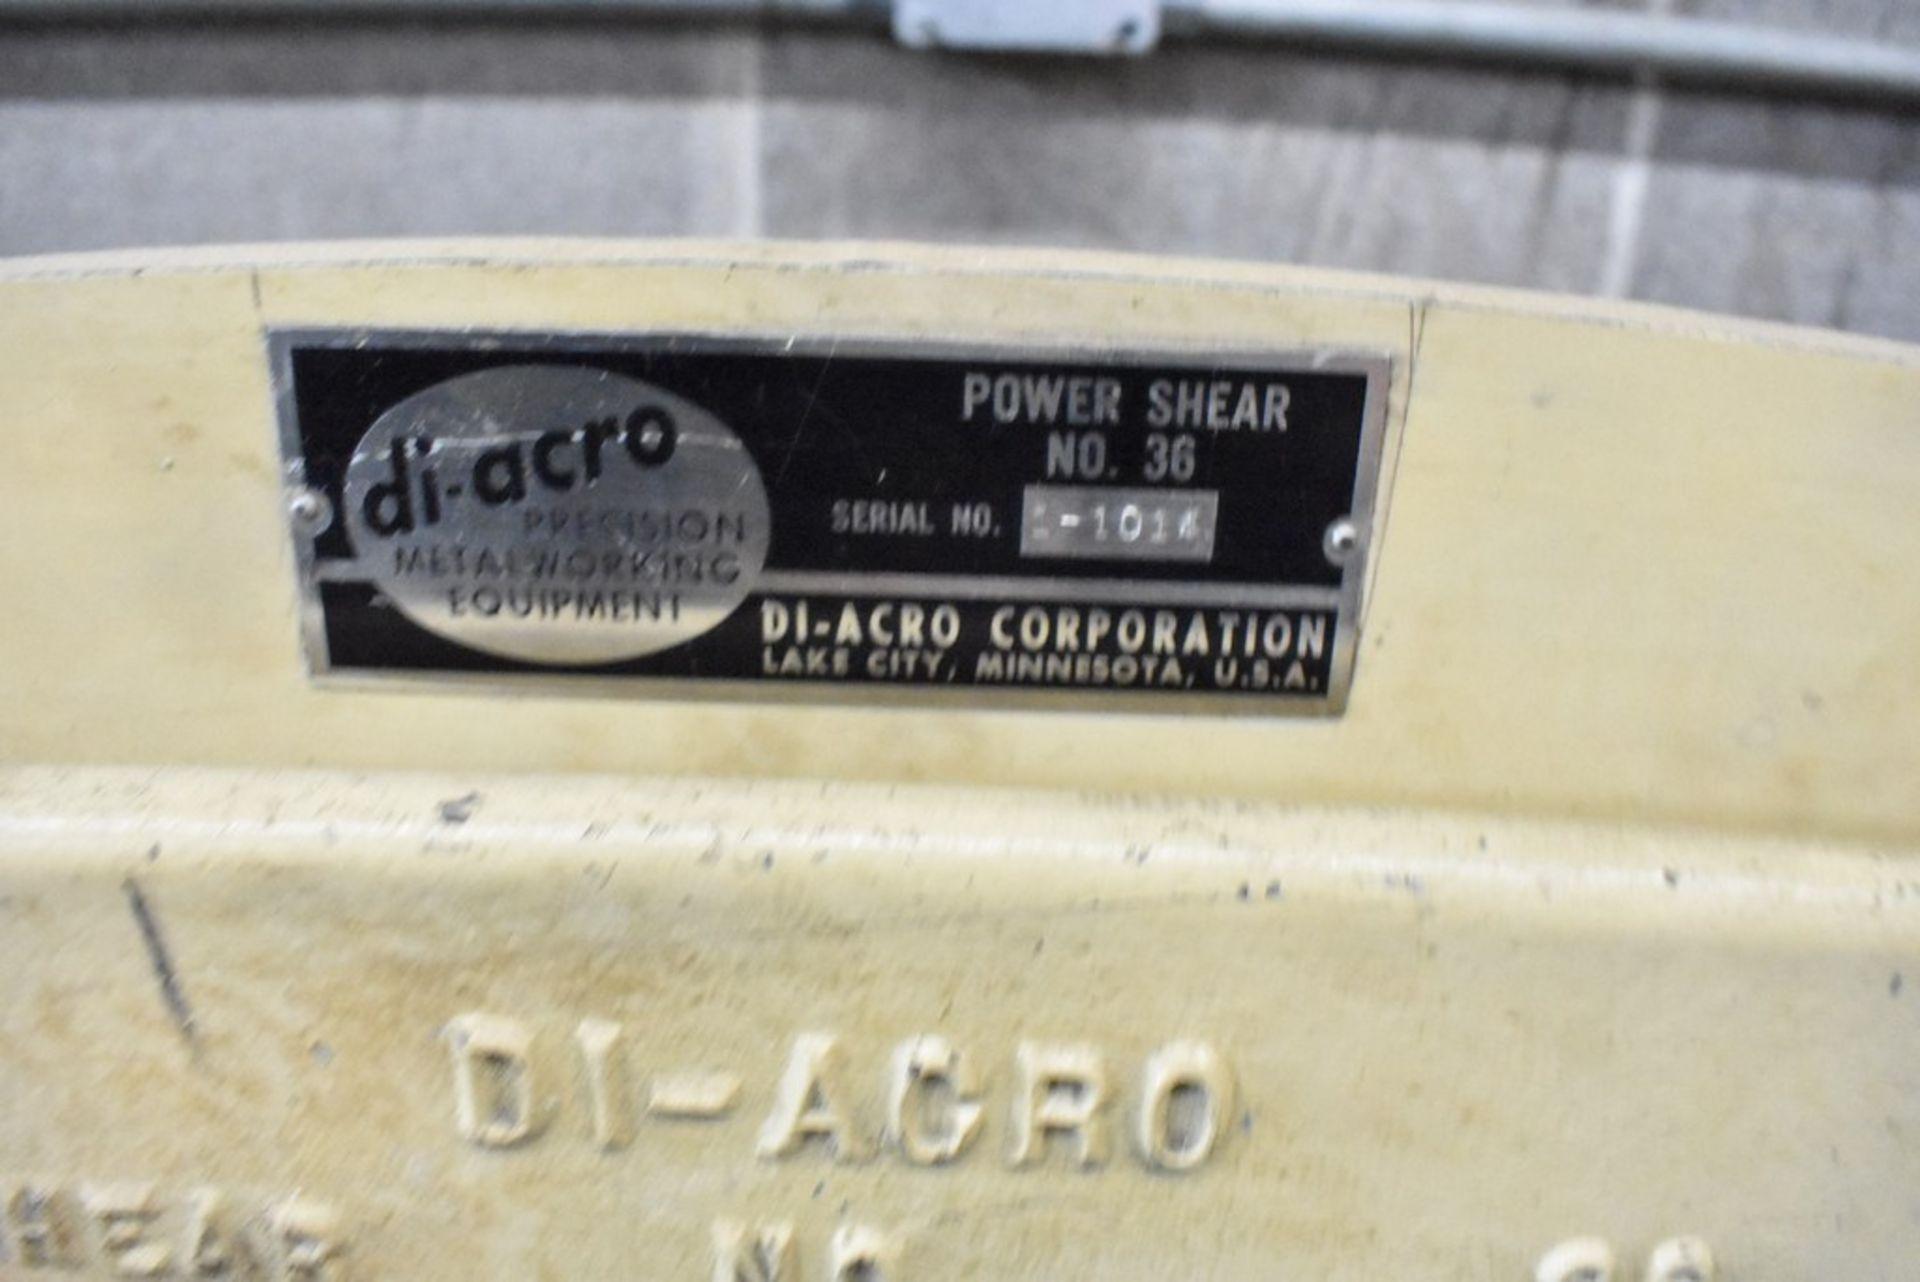 DI-ACRO NO. 36 POWER SHEAR, S/N 1-1014 - Image 3 of 7